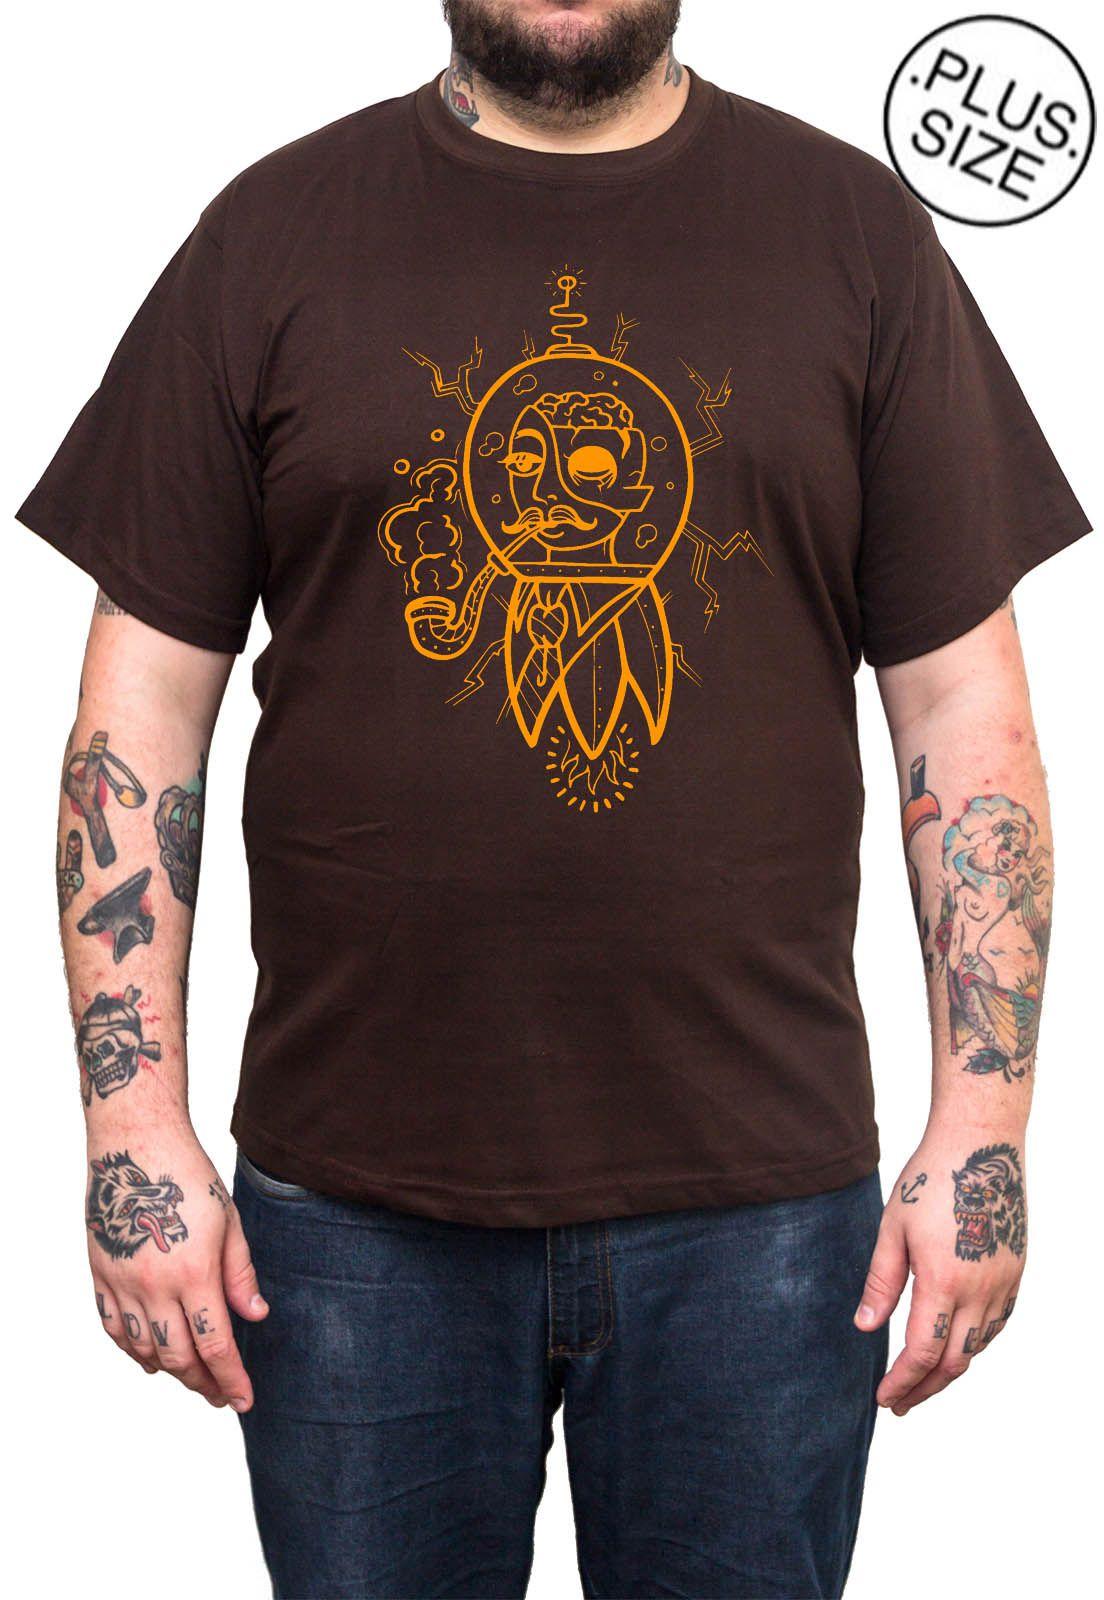 Camiseta Hshop Future Man - Marrom - Plus Size - Tamanho Grande XG  - HShop